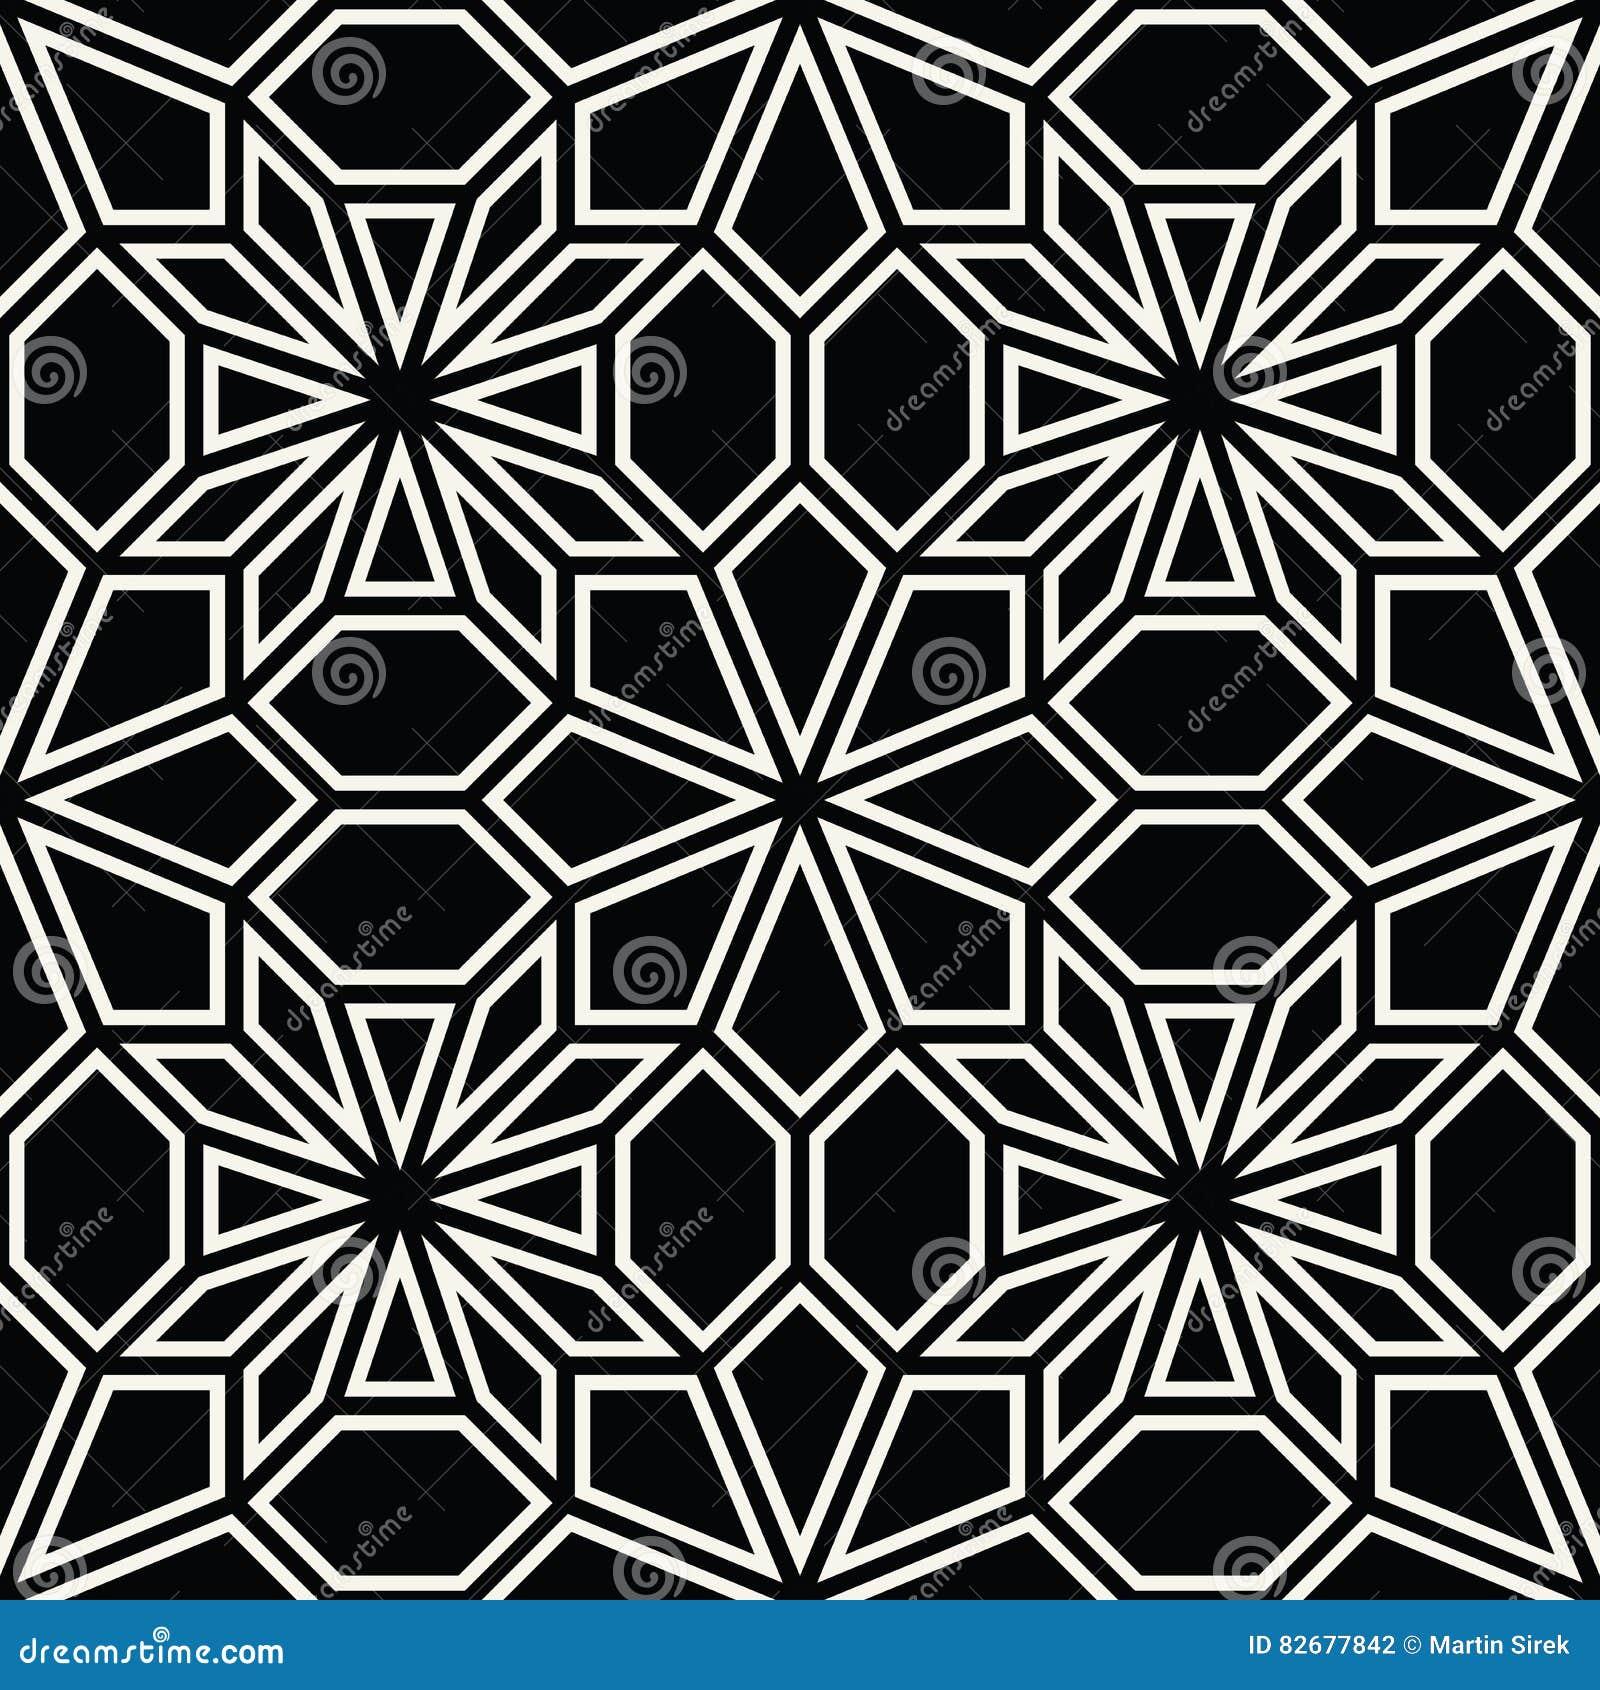 Deco Noir Et Blanc abstract geometric black and white deco art pillow mosaic